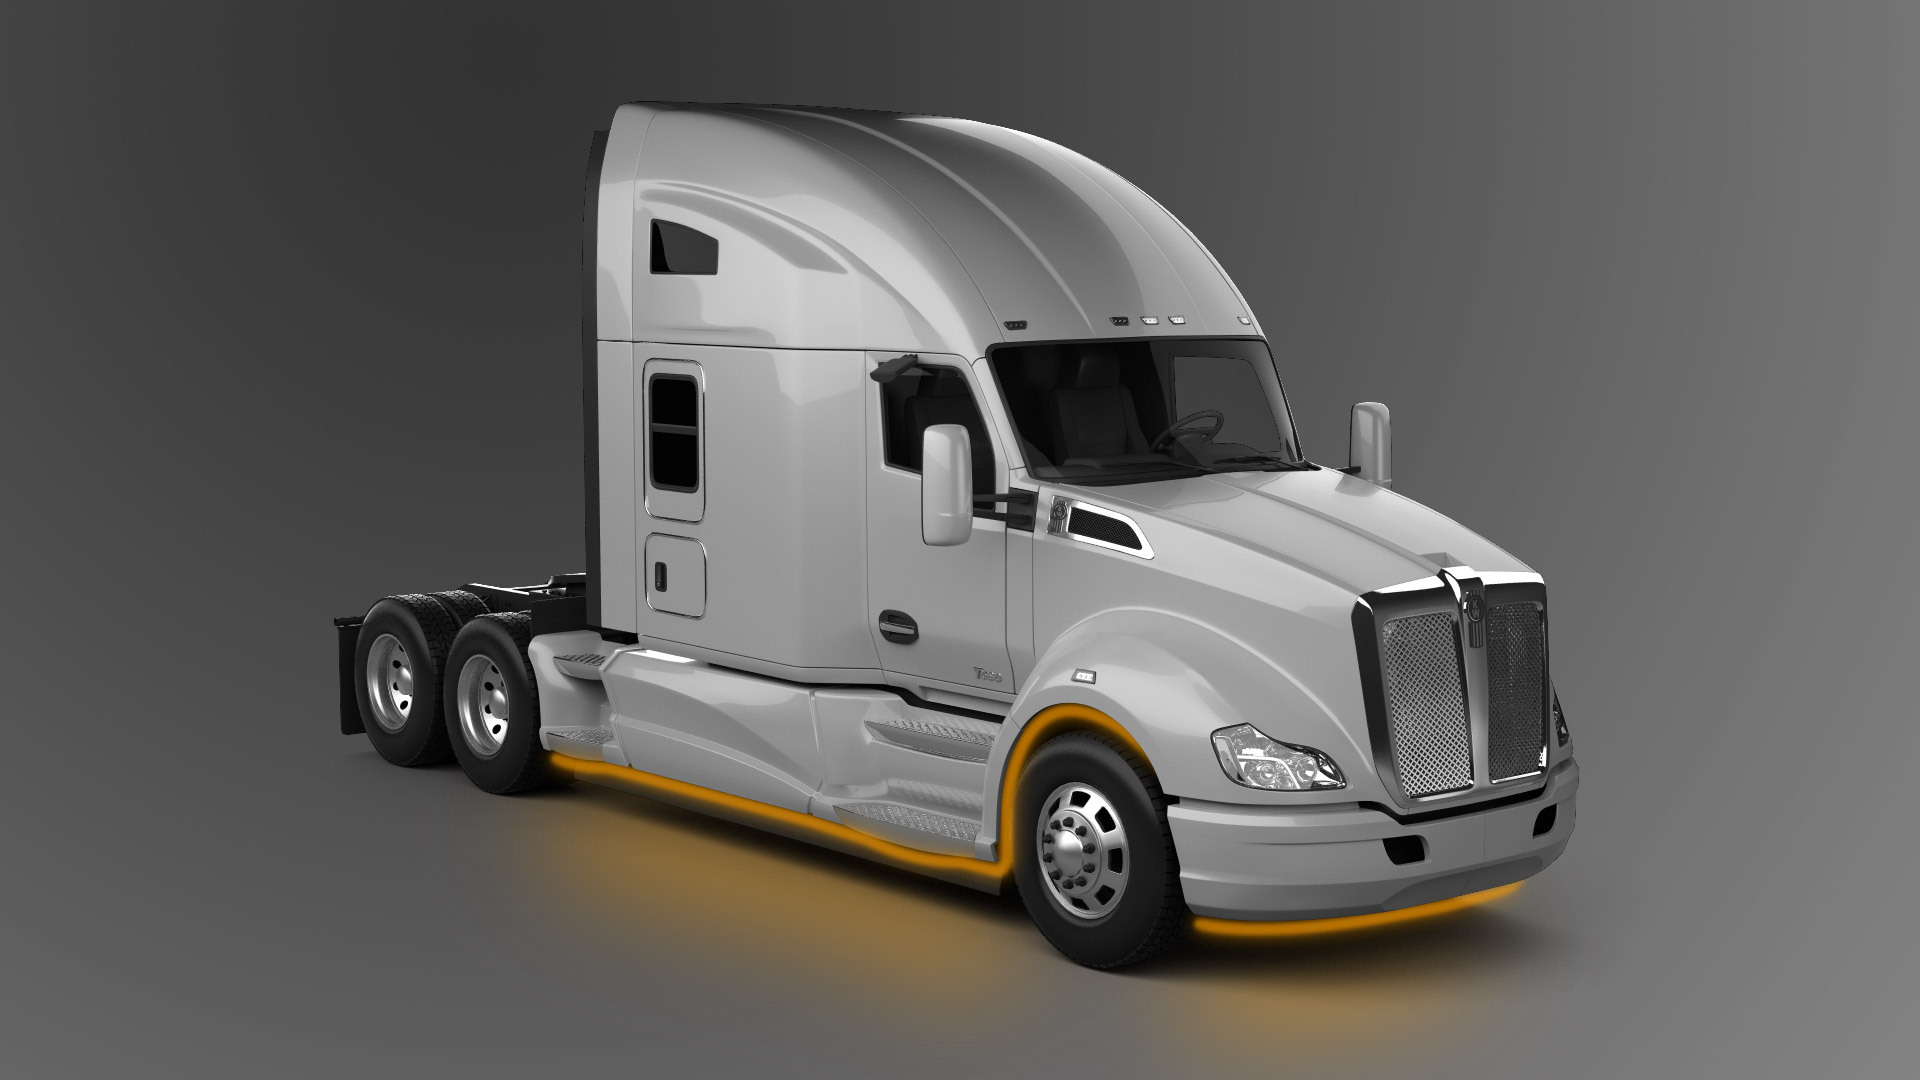 Truck LED Lighting underglow on Kenworth T680 model